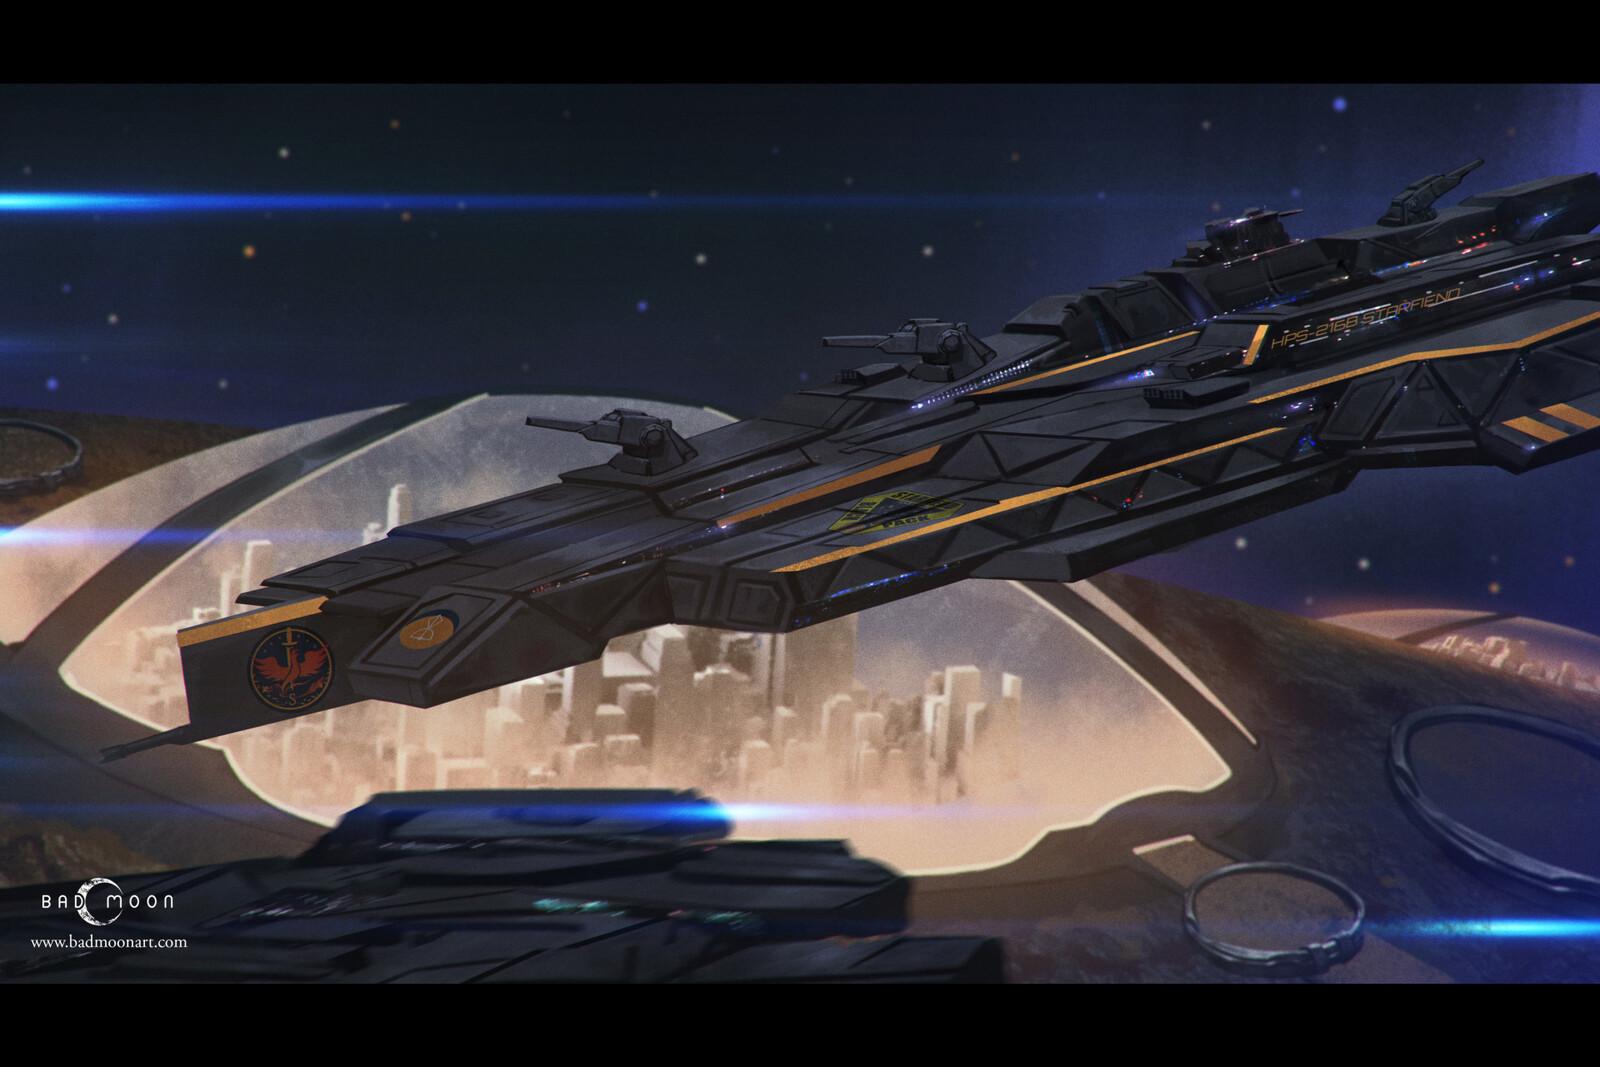 Spaceship Illo